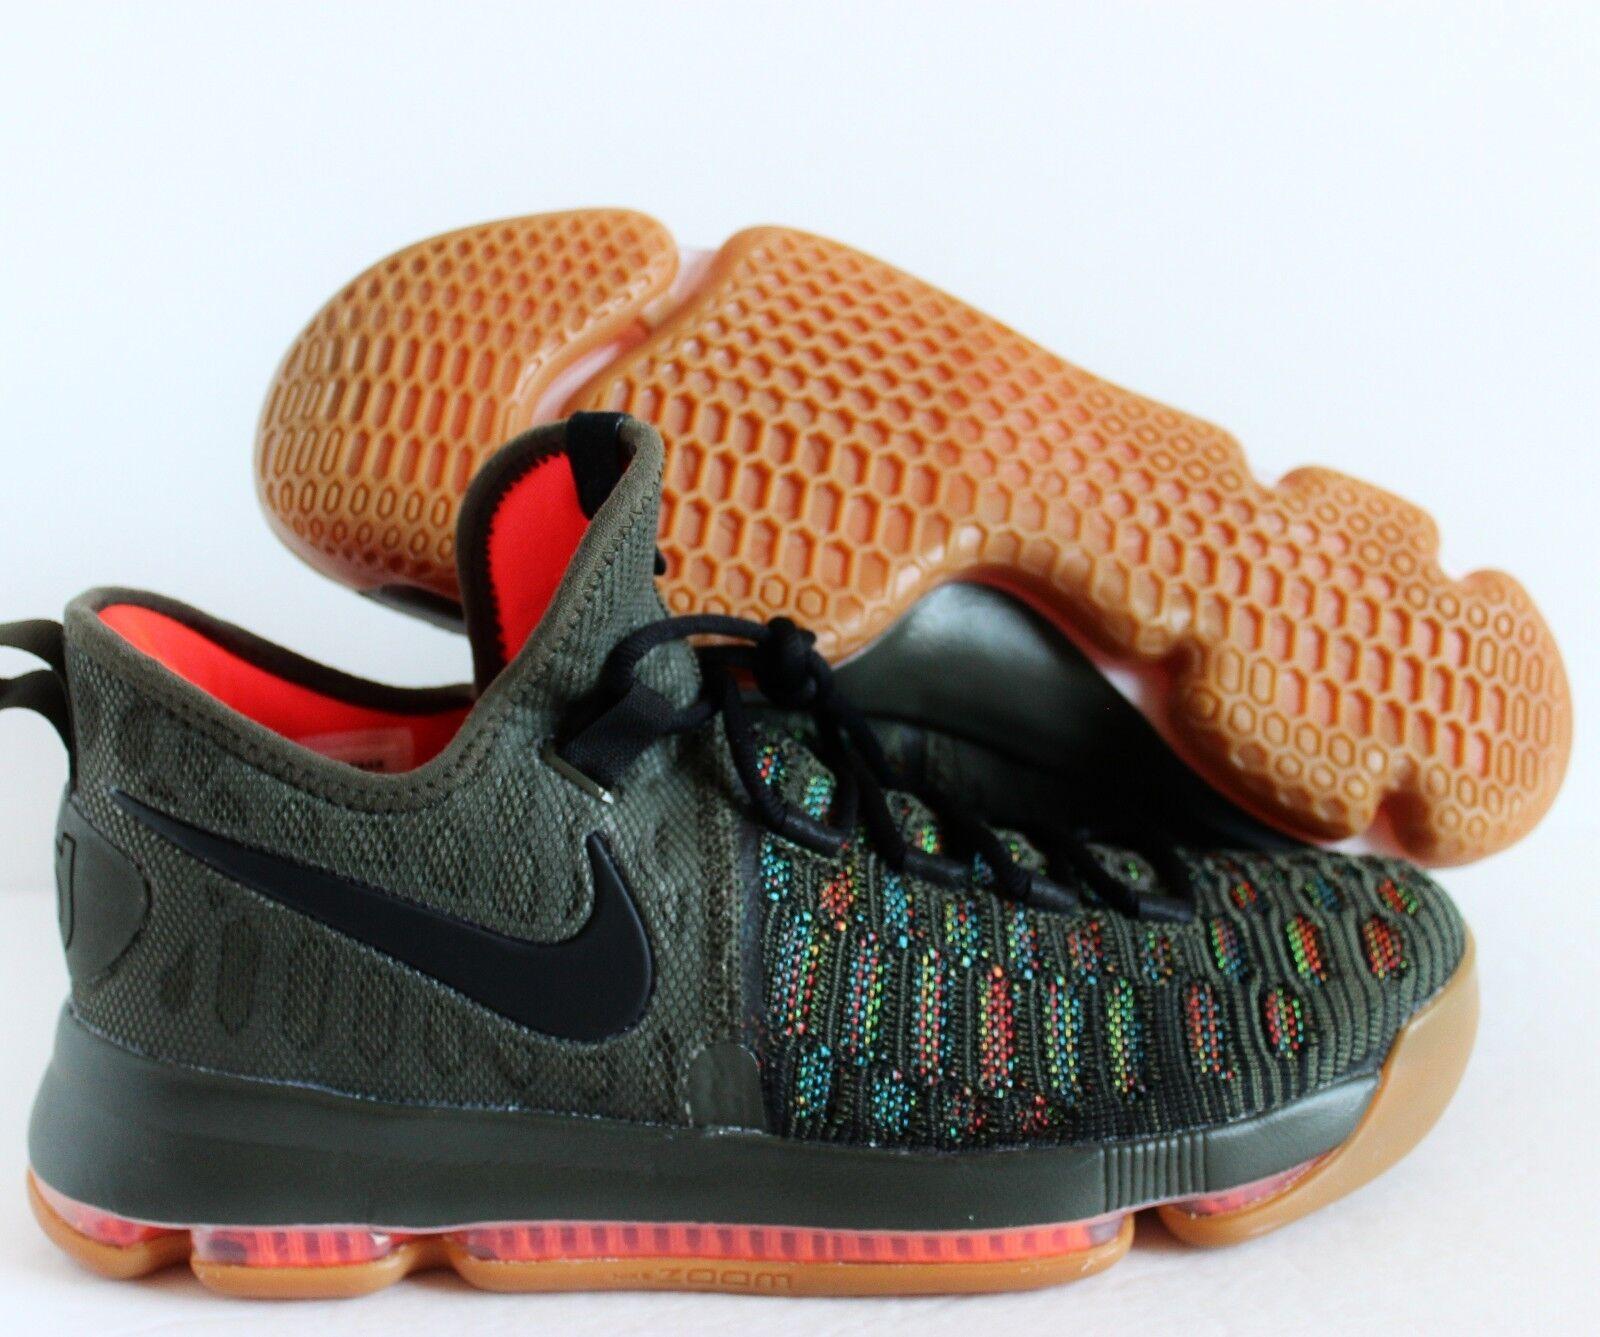 Nike KD 9 IX iD Multi-color Black-Green Kevin Durant SZ 10 [863695-985]